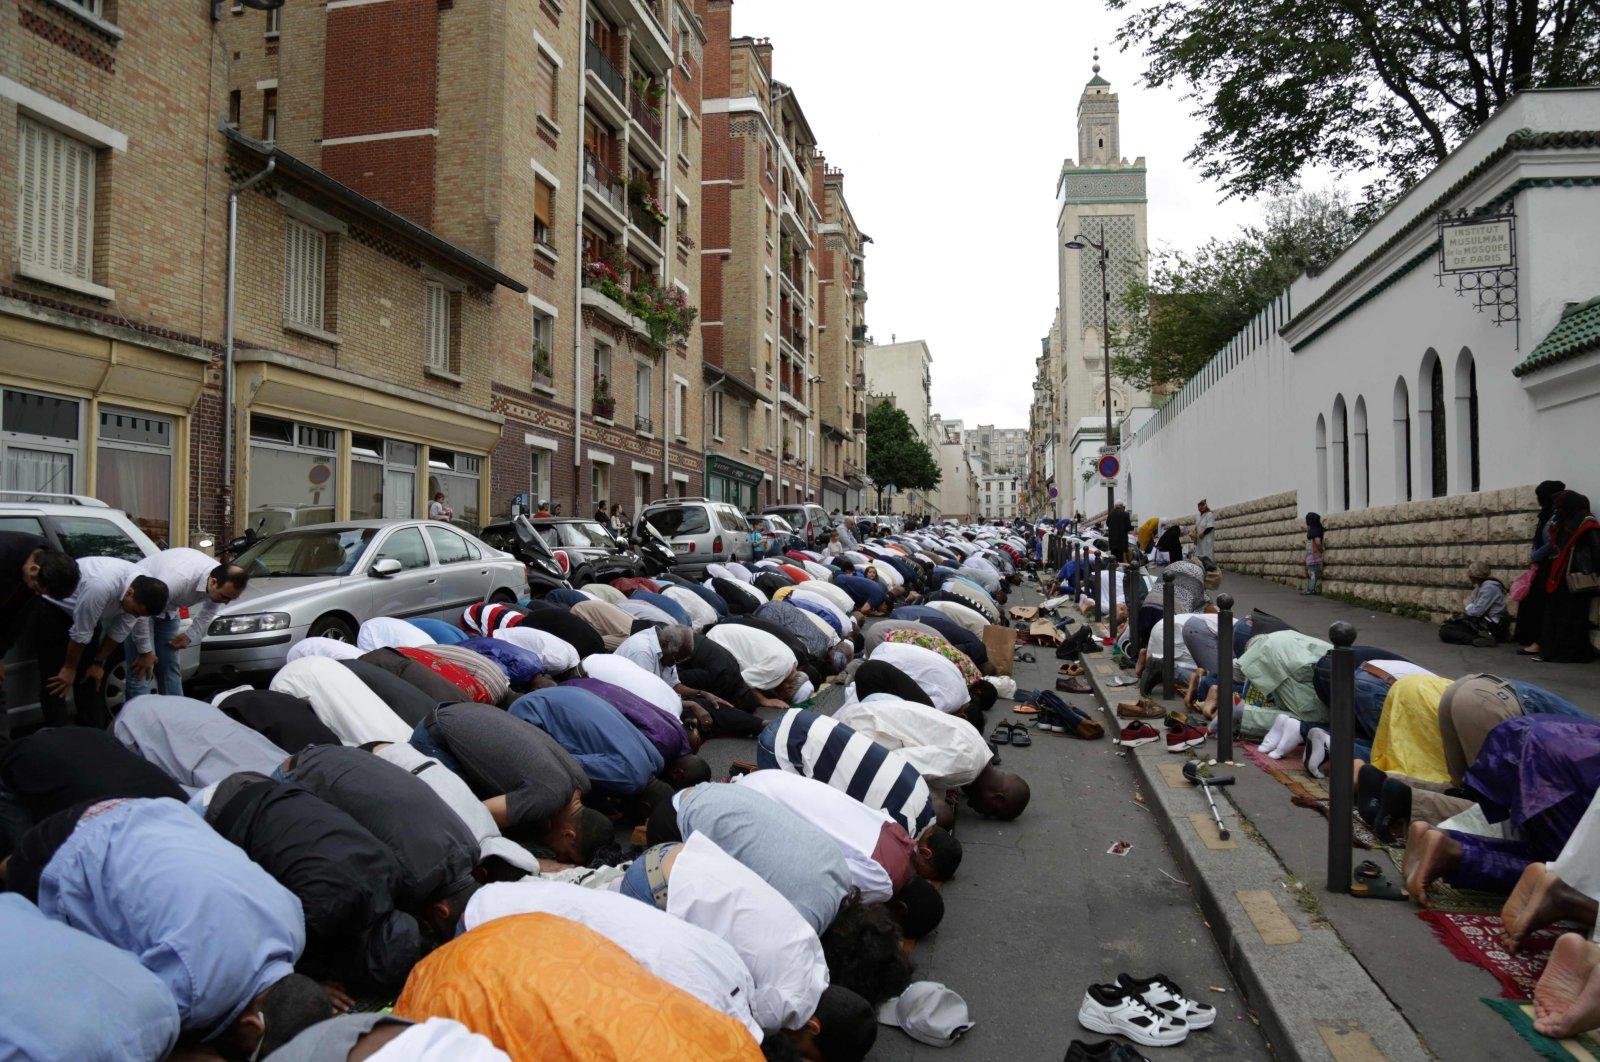 Muslims conduct Eid al-Fitr prayers outside the Grande Mosquee de Paris (Great Mosque of Paris) in Paris, France, June 25, 2017. (AFP File Photo)